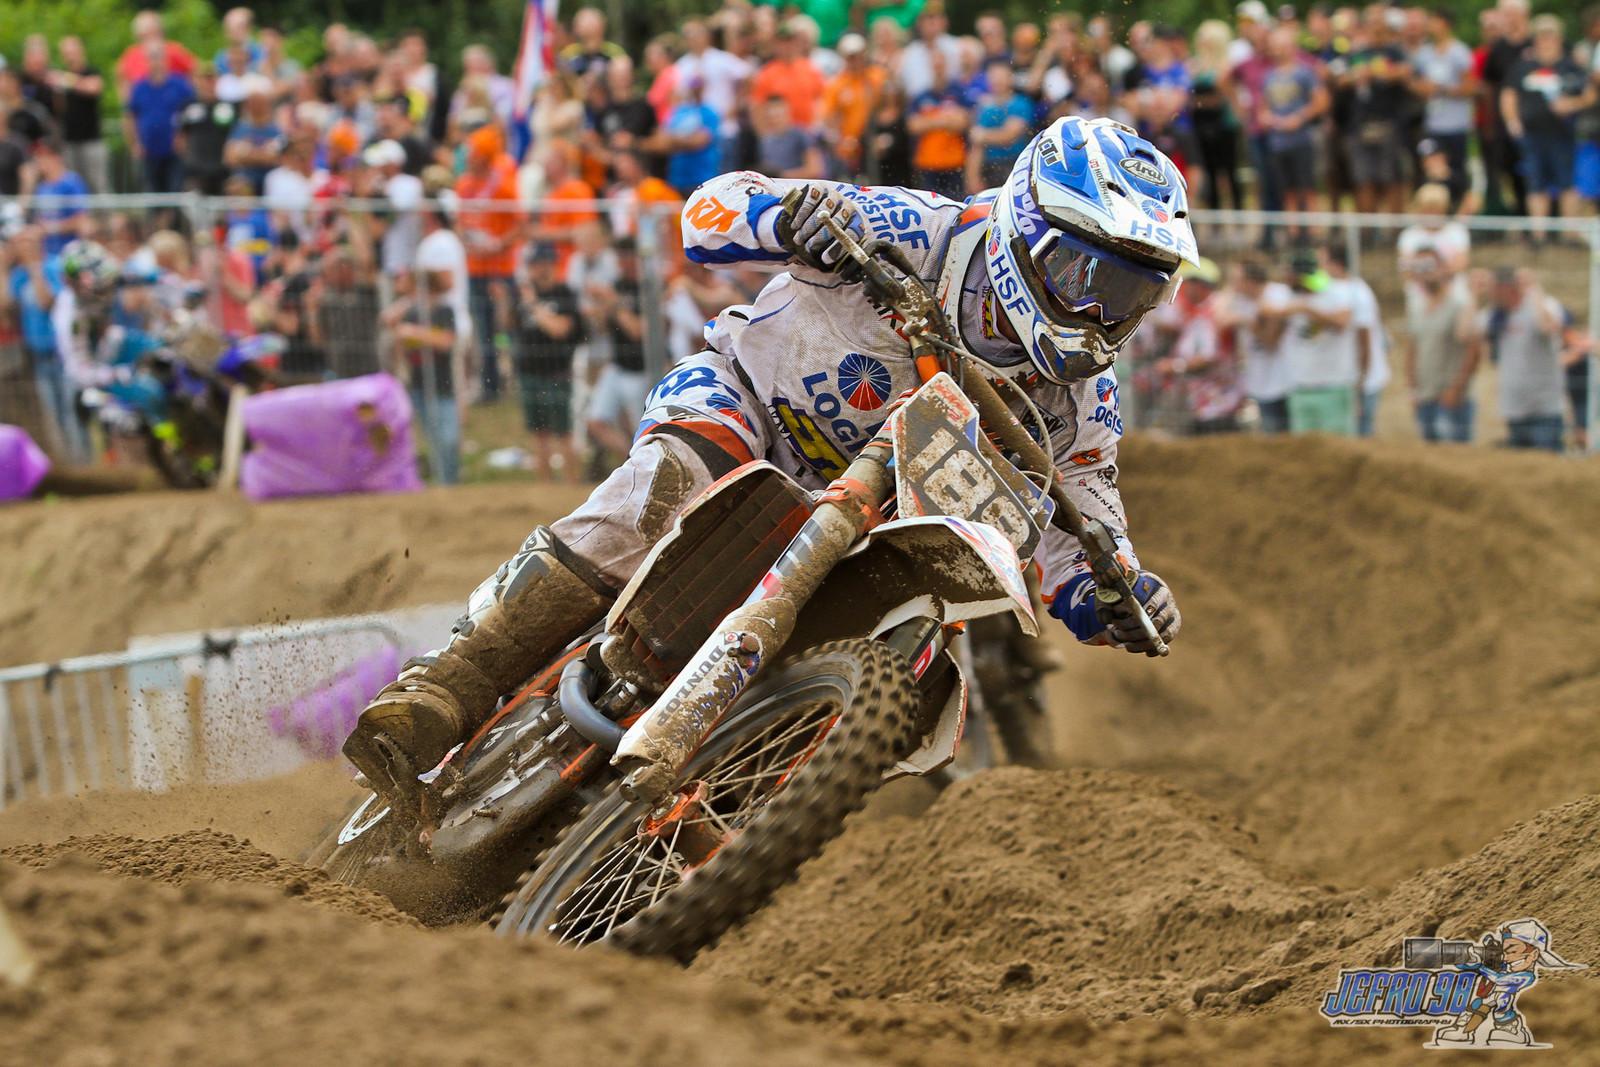 Brian Bogers - Photo Gallery: MXGP of Limburg - Motocross Pictures - Vital MX